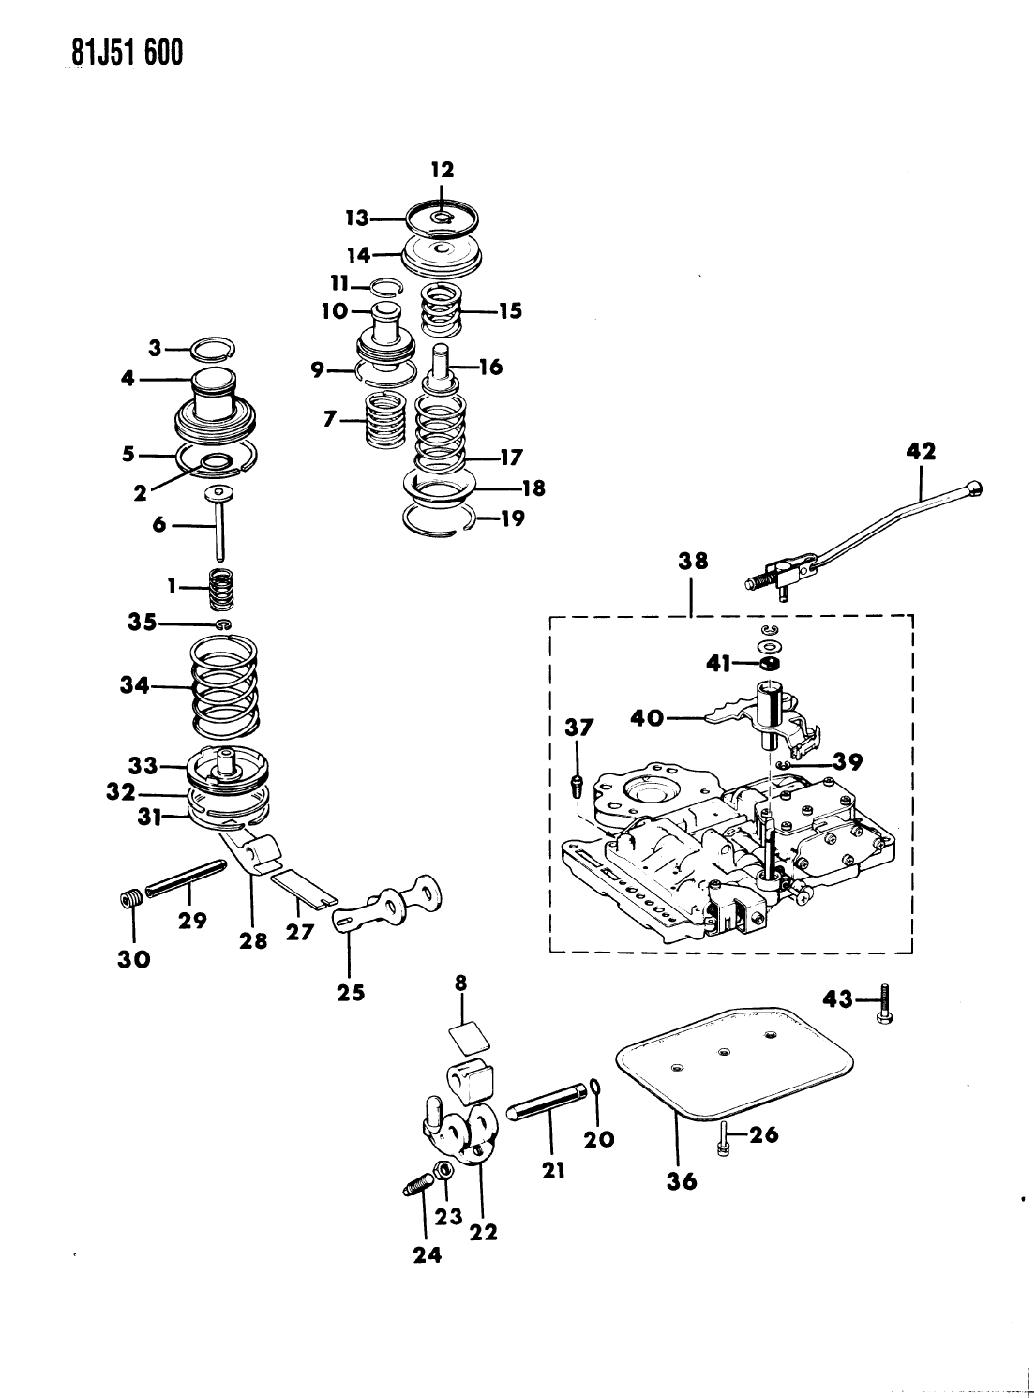 1986 Jeep Wrangler Servos